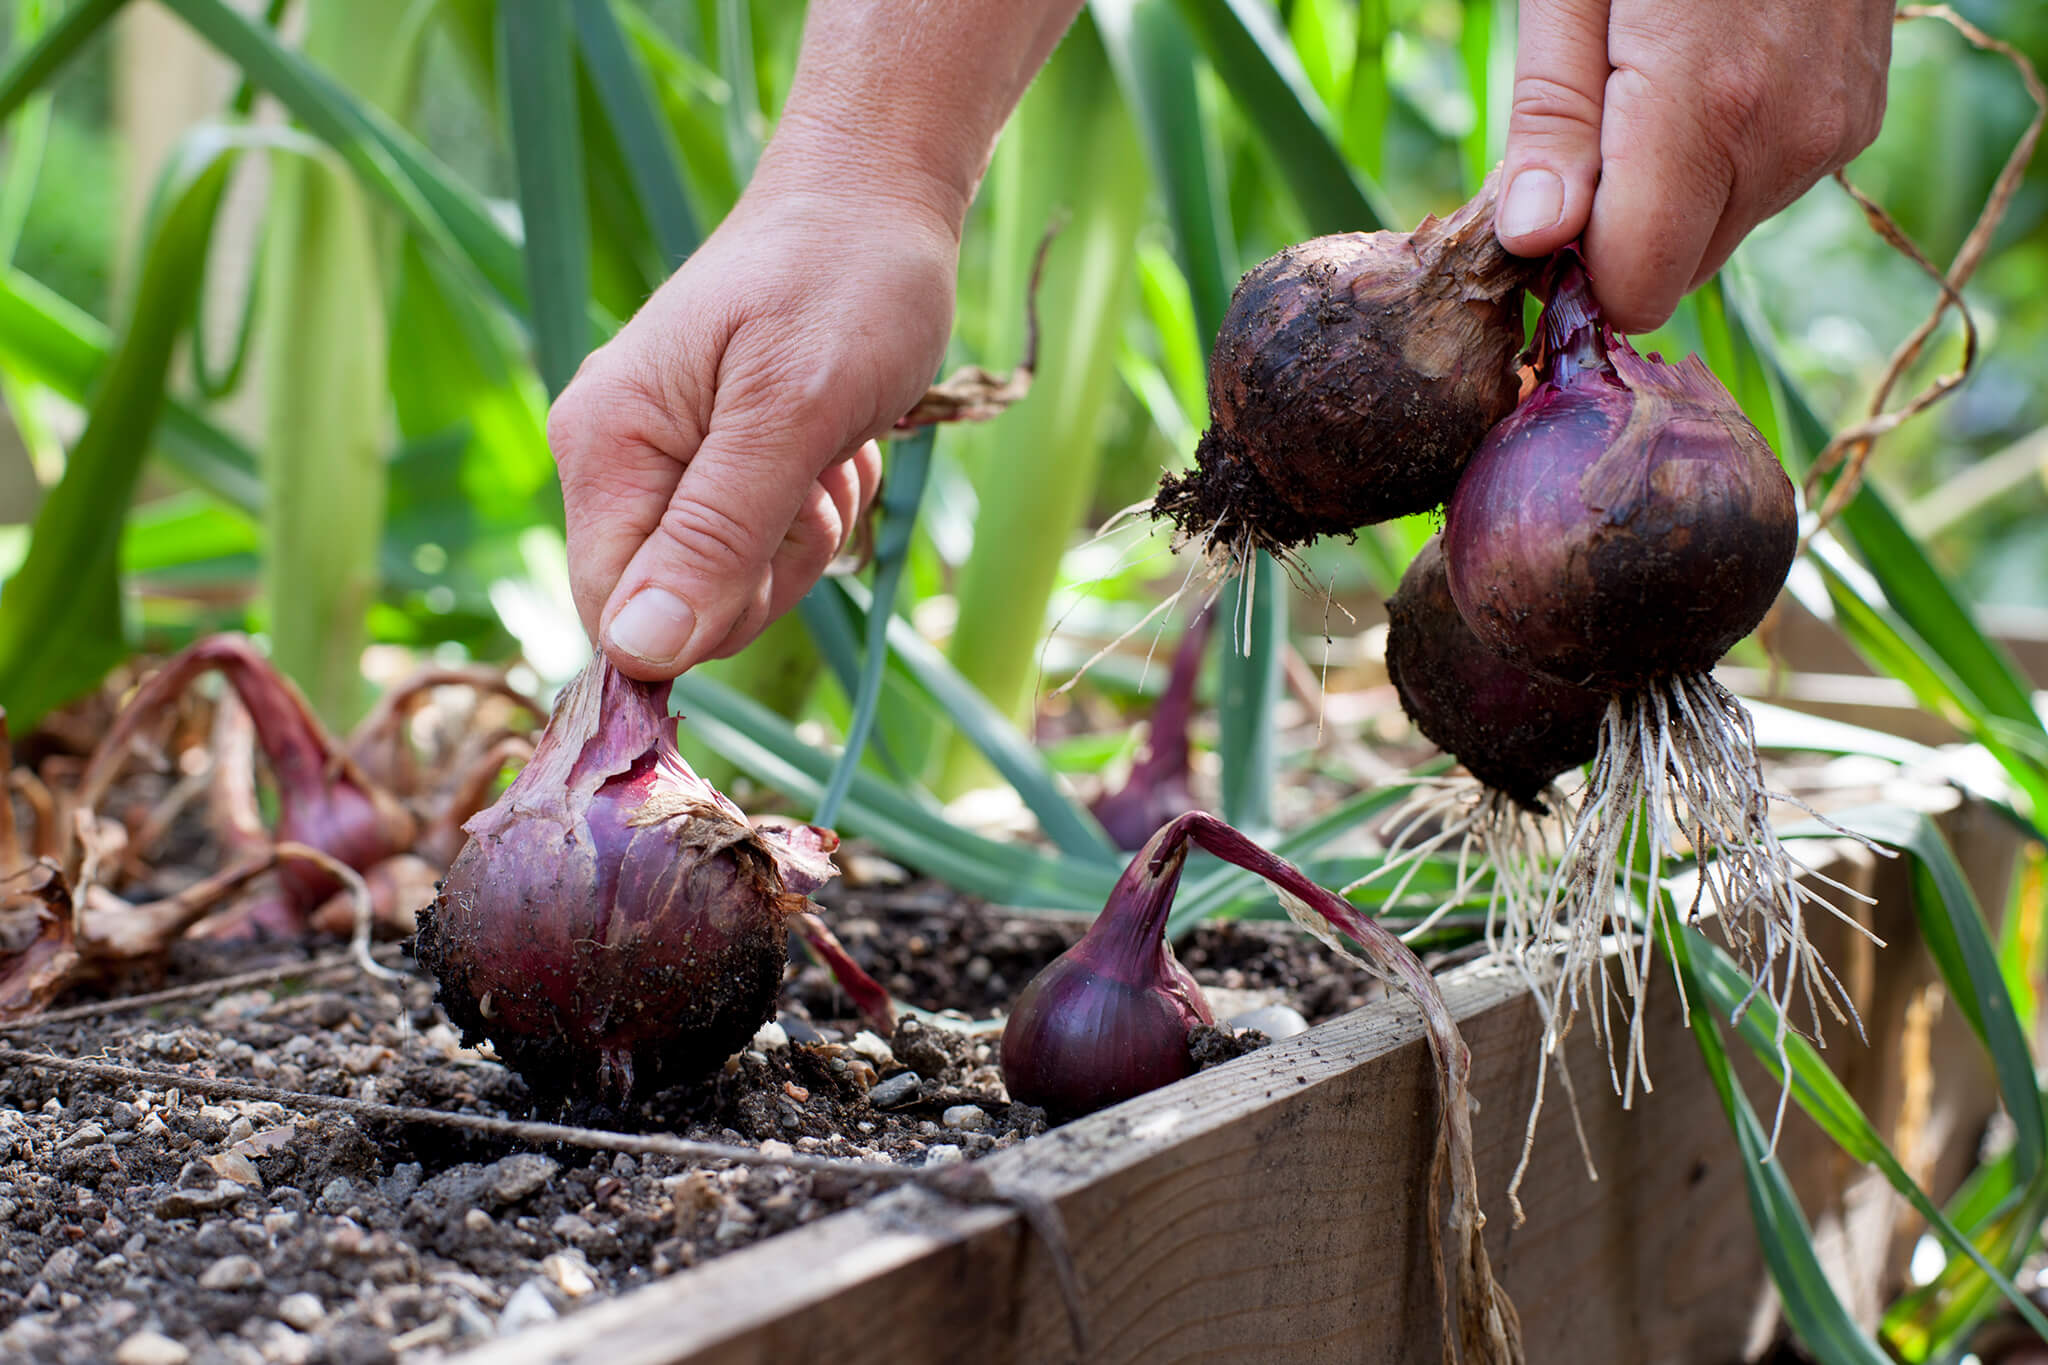 onion-harvesting-9